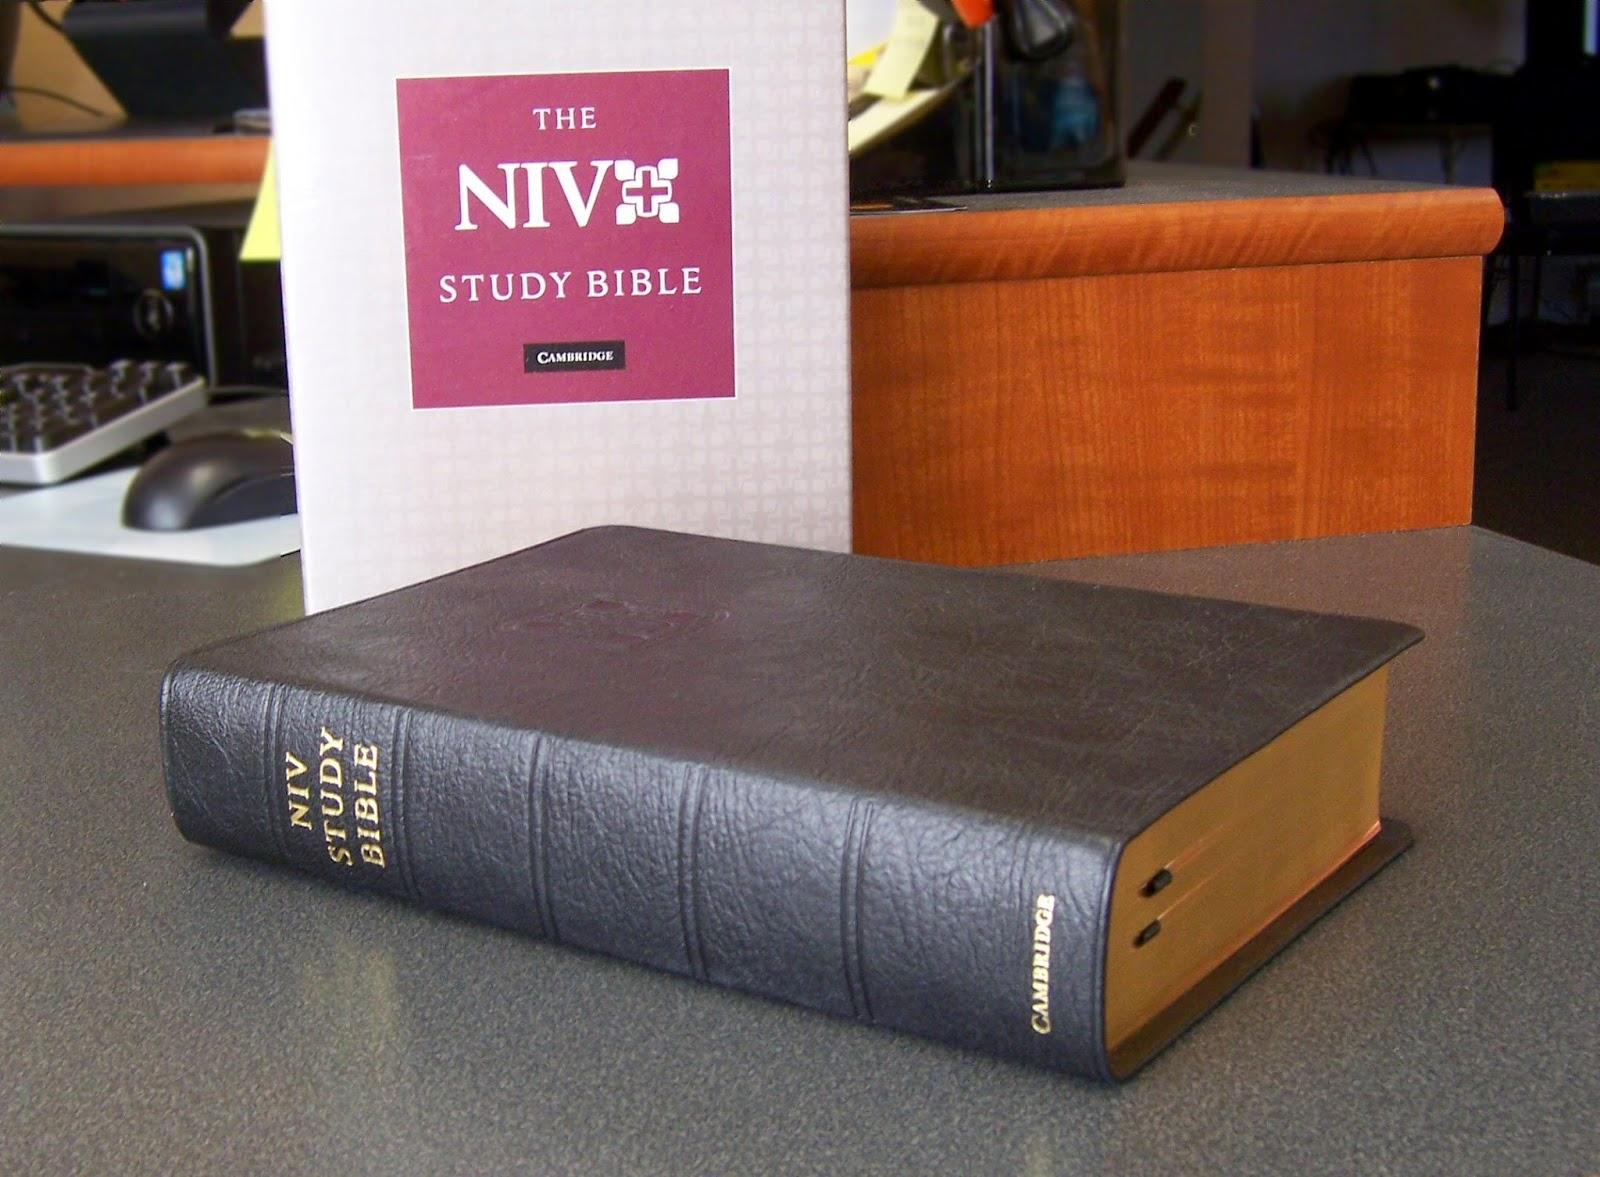 Biblia Sacra Design: NIV 1984 Bibles: Going    Going